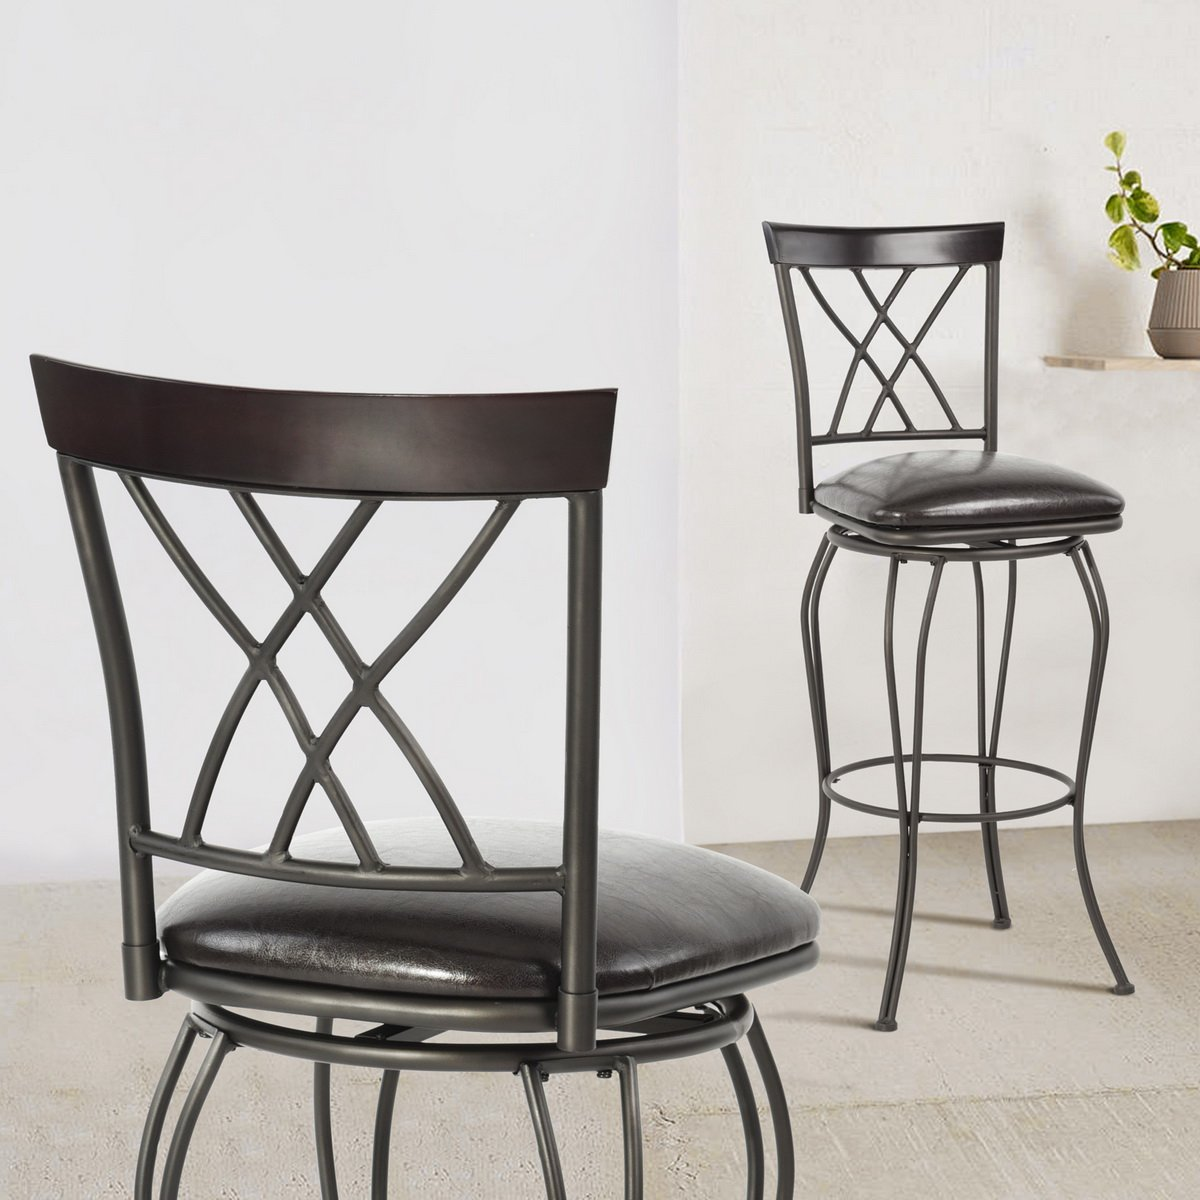 FurnitureR 24'' Circles-Back Swivel Bar stool Counter Height Bar Chair by FurnitureR (Image #1)